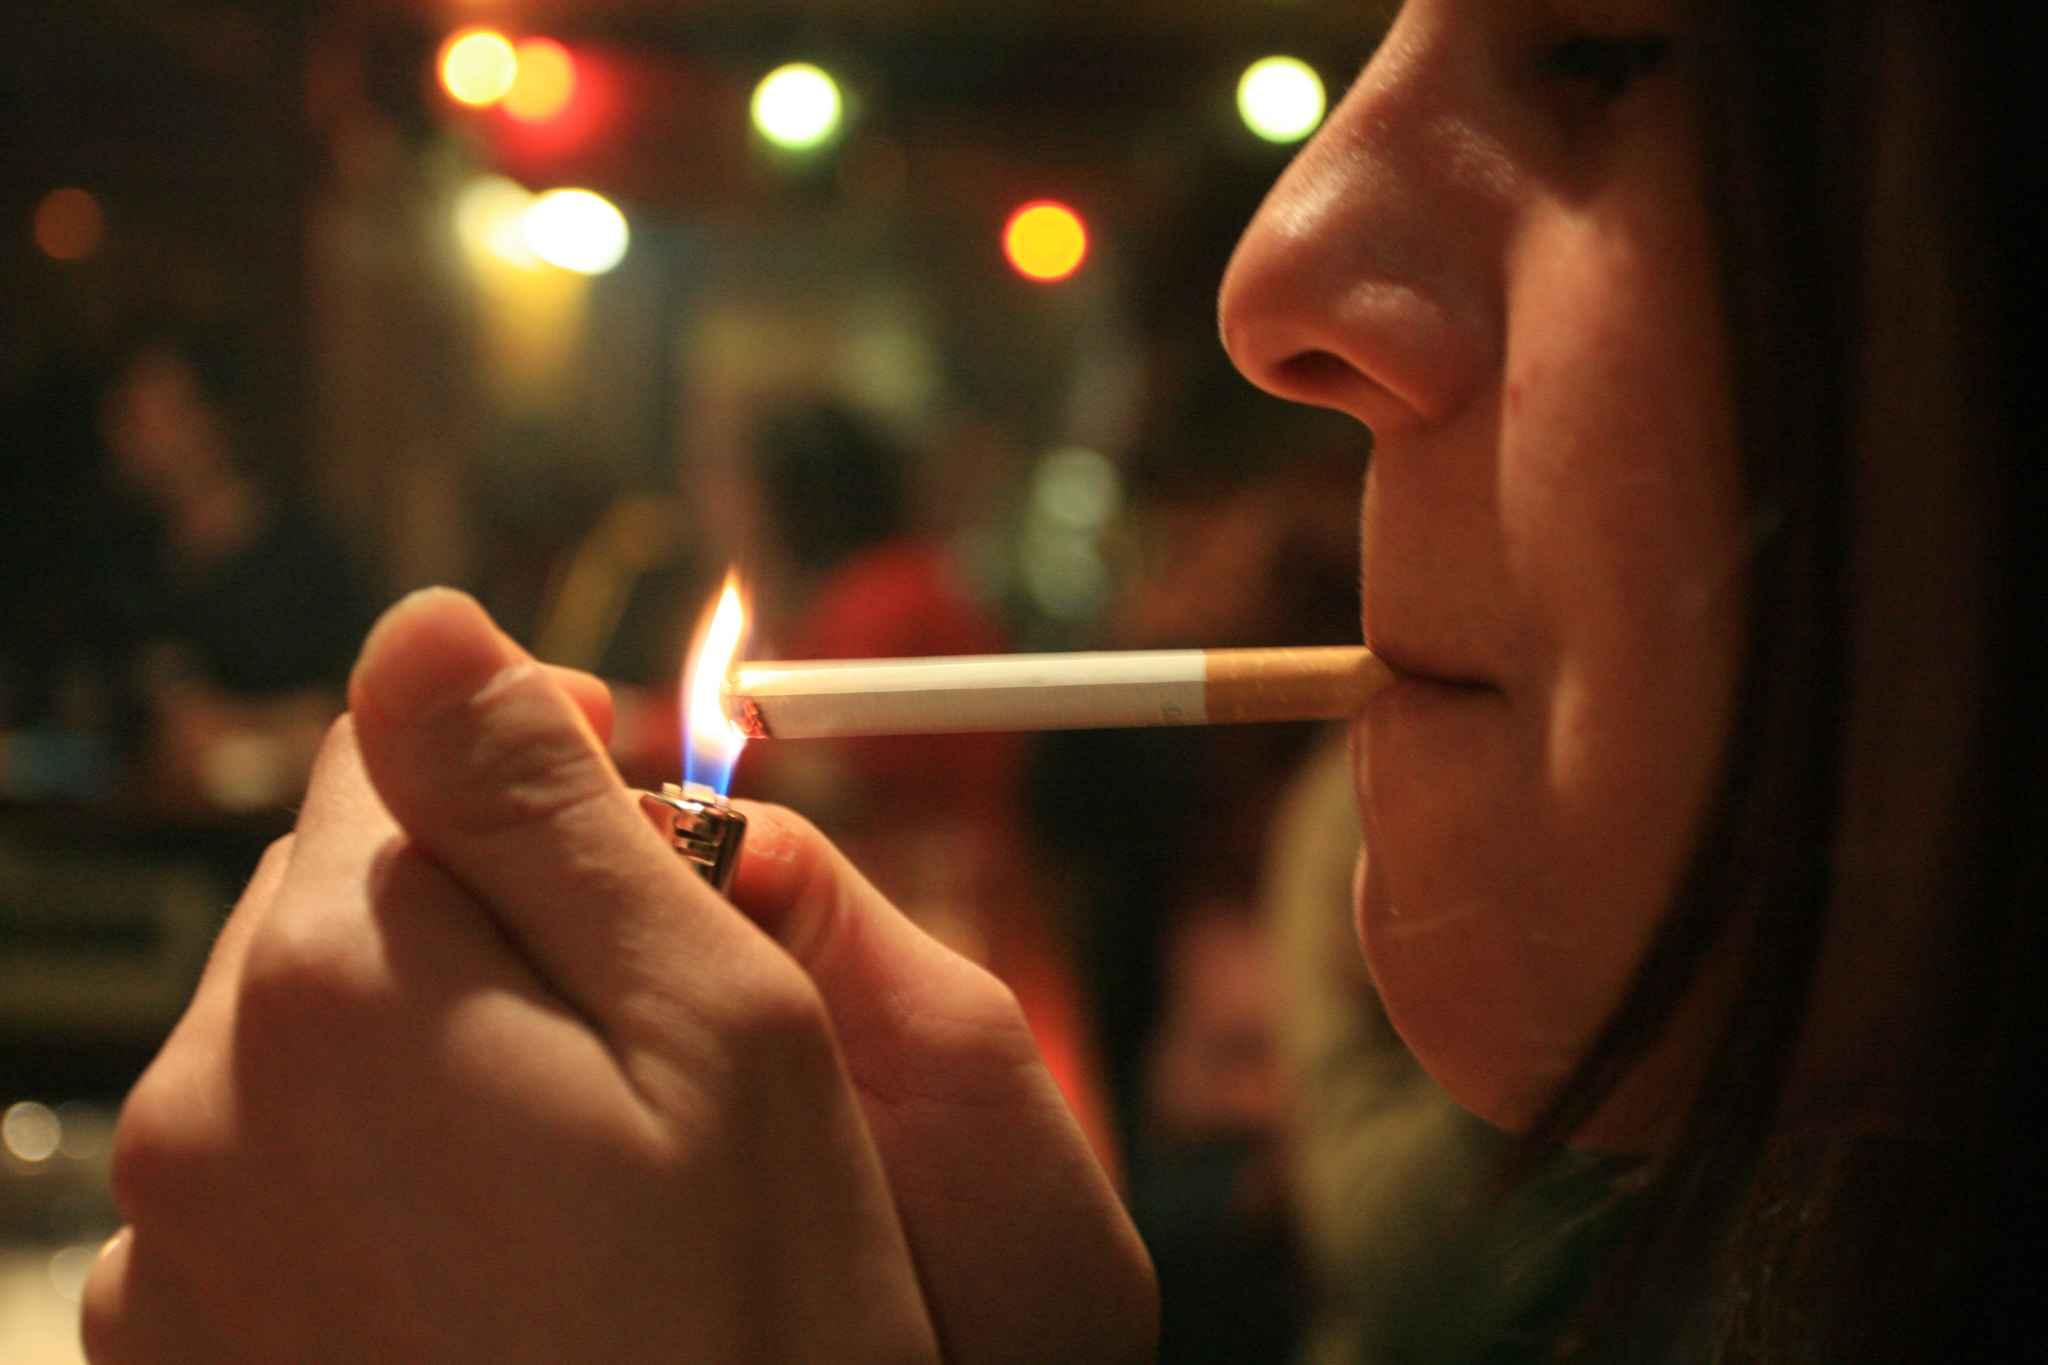 Cesser de fumer radicalement